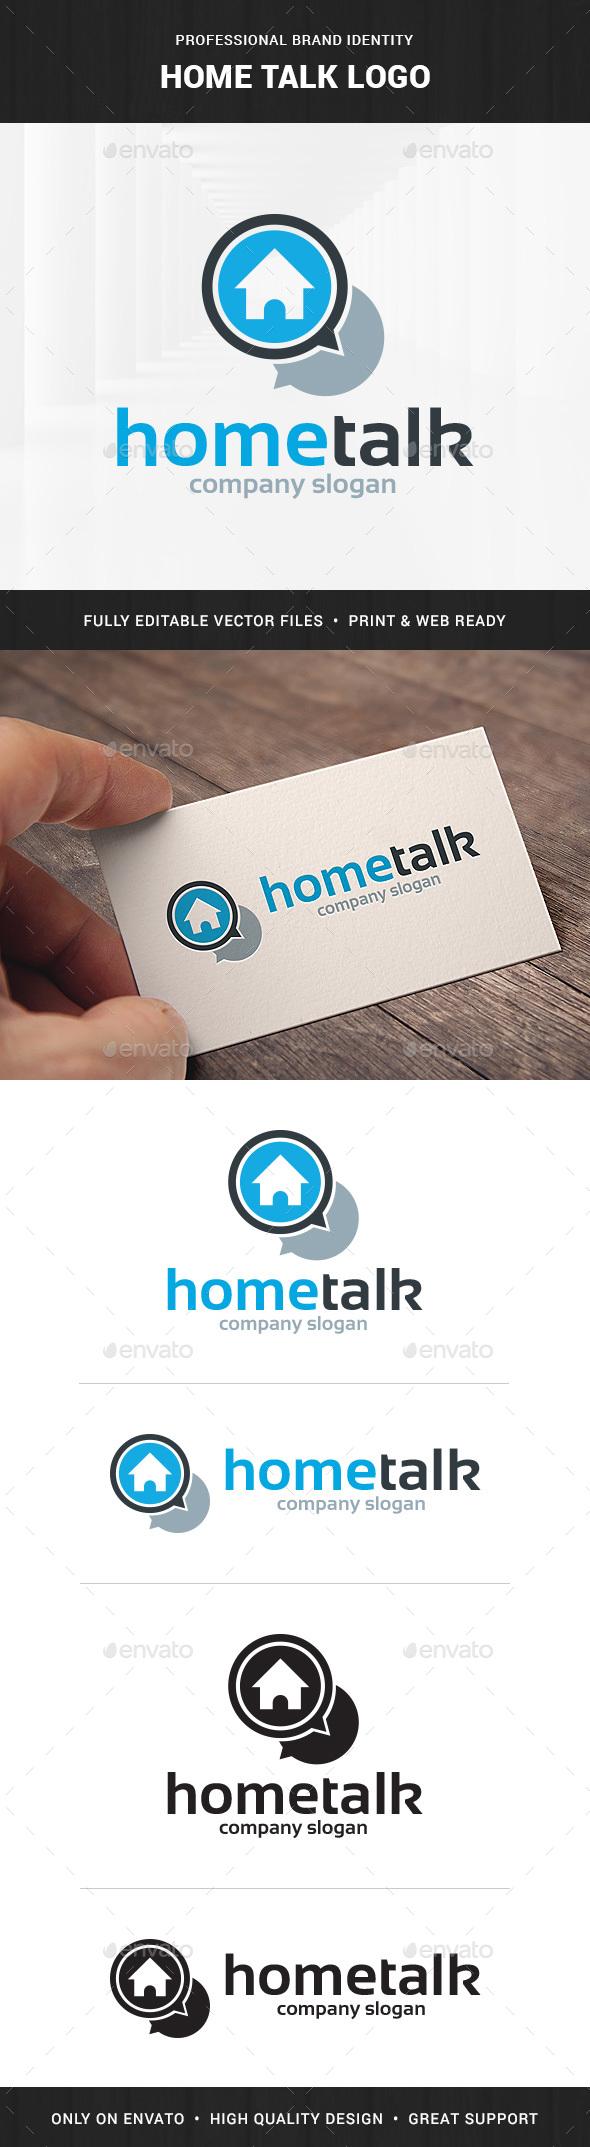 Home Talk Logo Template - Buildings Logo Templates